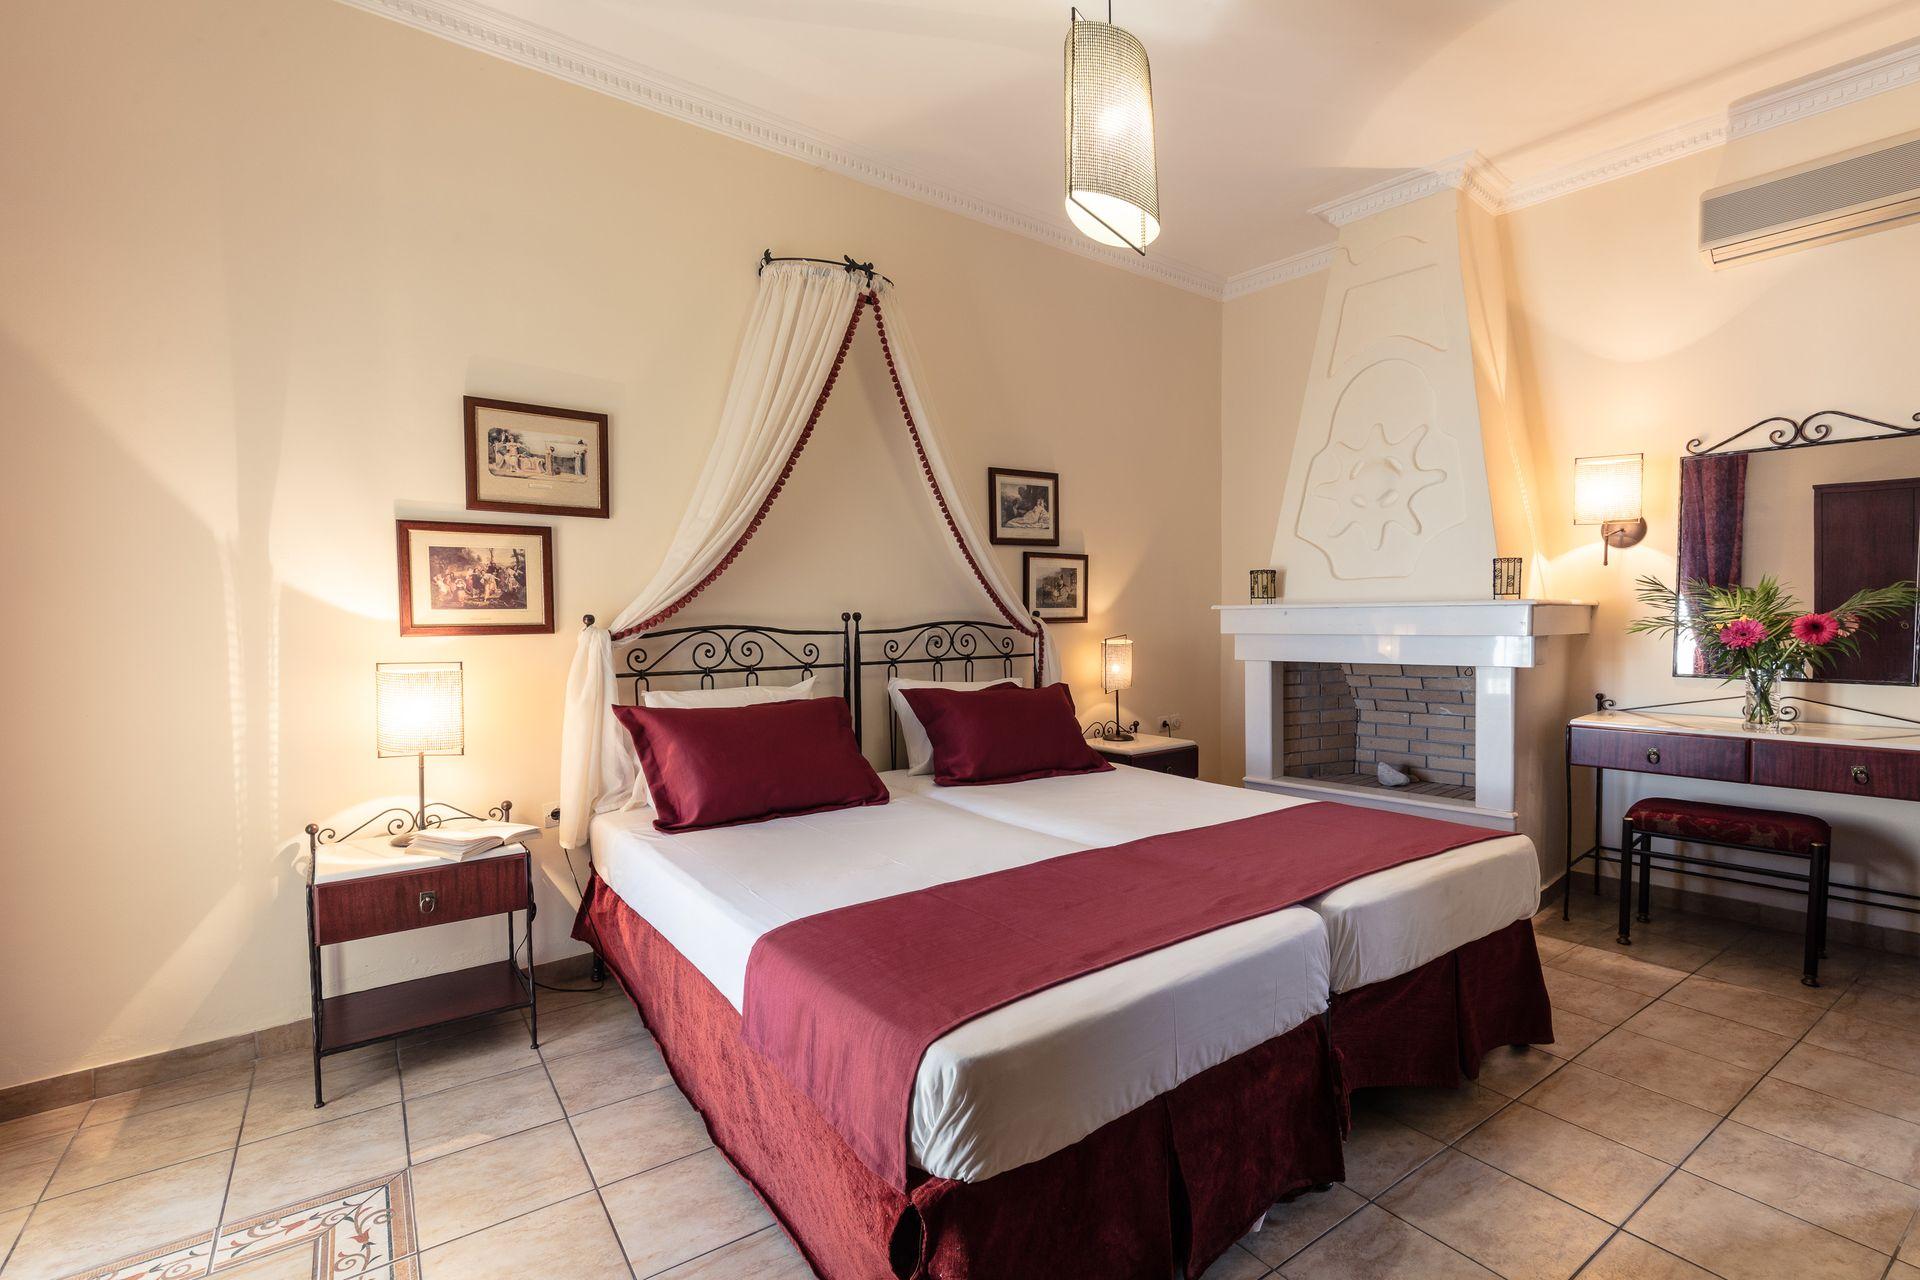 Agistri Hotel - Αγκίστρι ✦ 5 Ημέρες (4 Διανυκτερεύσεις) ✦ 2 άτομα + 1 παιδί έως 3 ετών ✦ Χωρίς Πρωινό ✦ 01/08/2021 έως 31/08/2021 ✦ Κοντά στην παραλία!